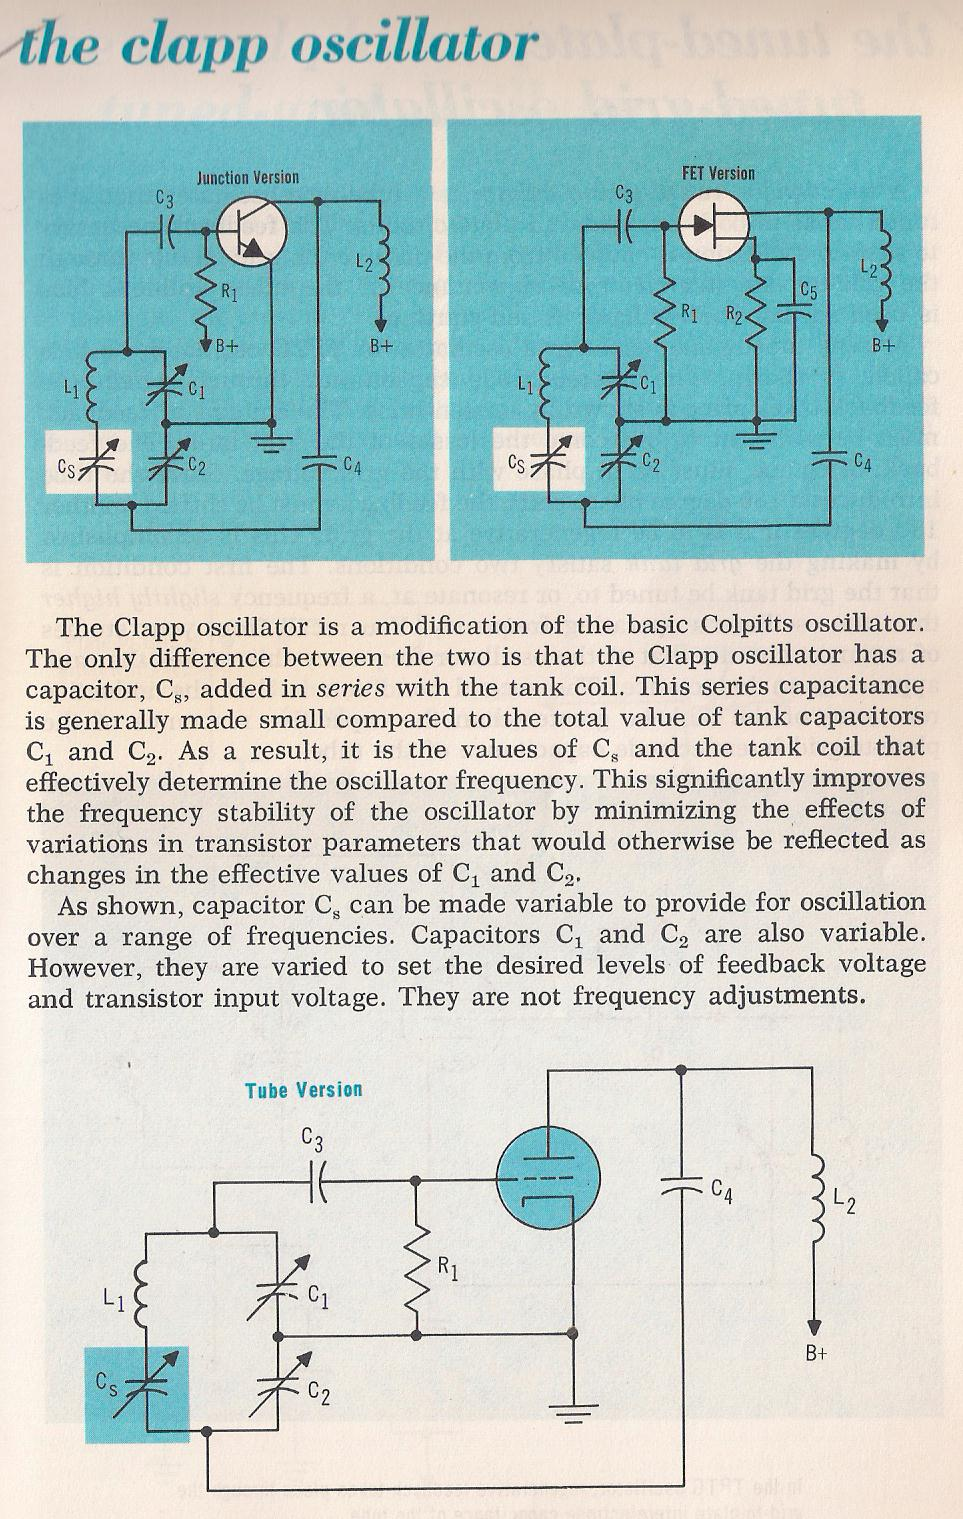 Oscillators The Colpitts Oscillator Circuit Consists Of A 019 Reinartz Larry E Gugle K4rfe 020